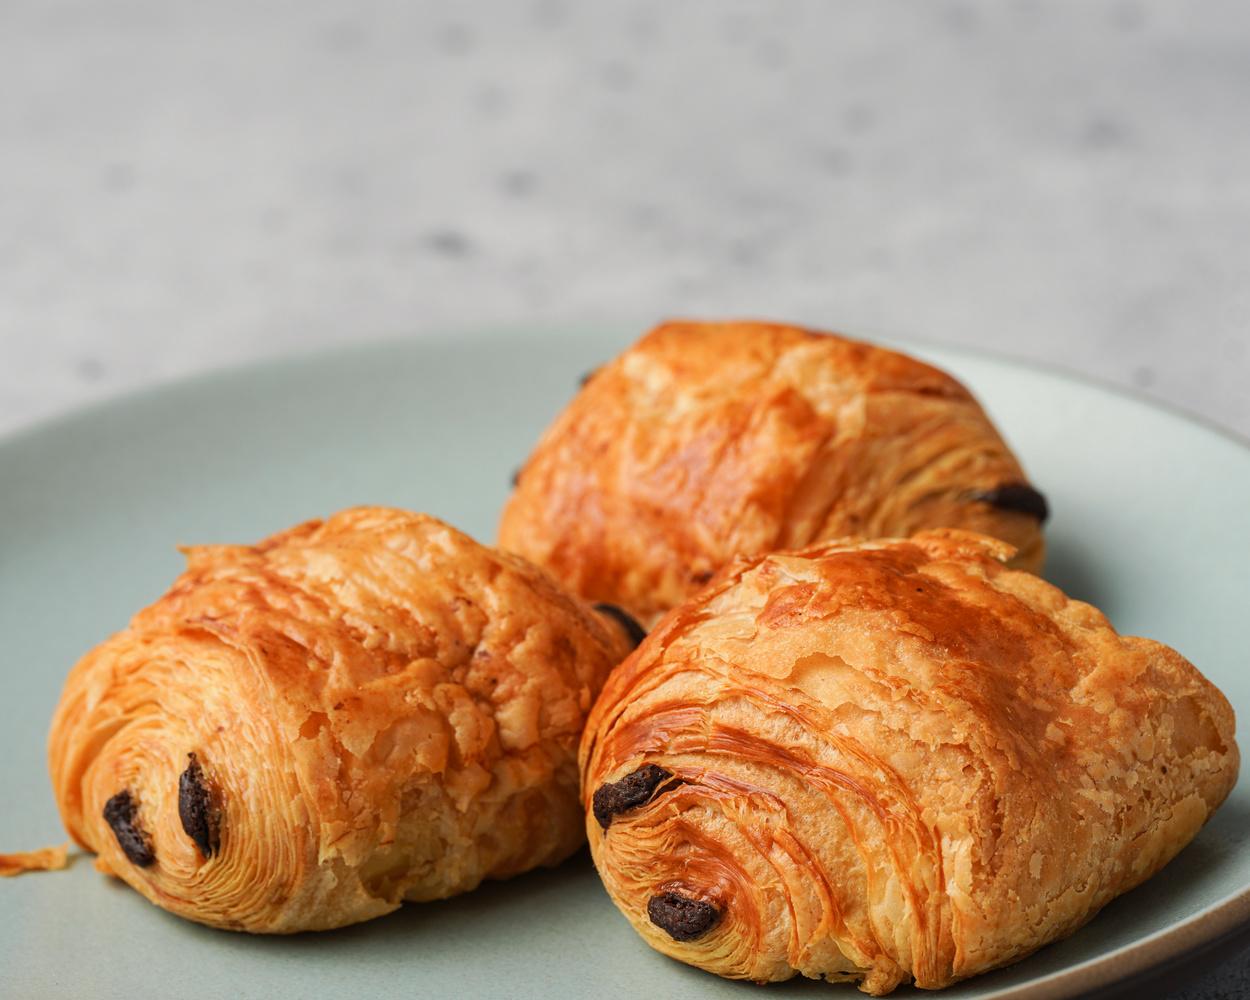 Breakfast by Skyler Ewing